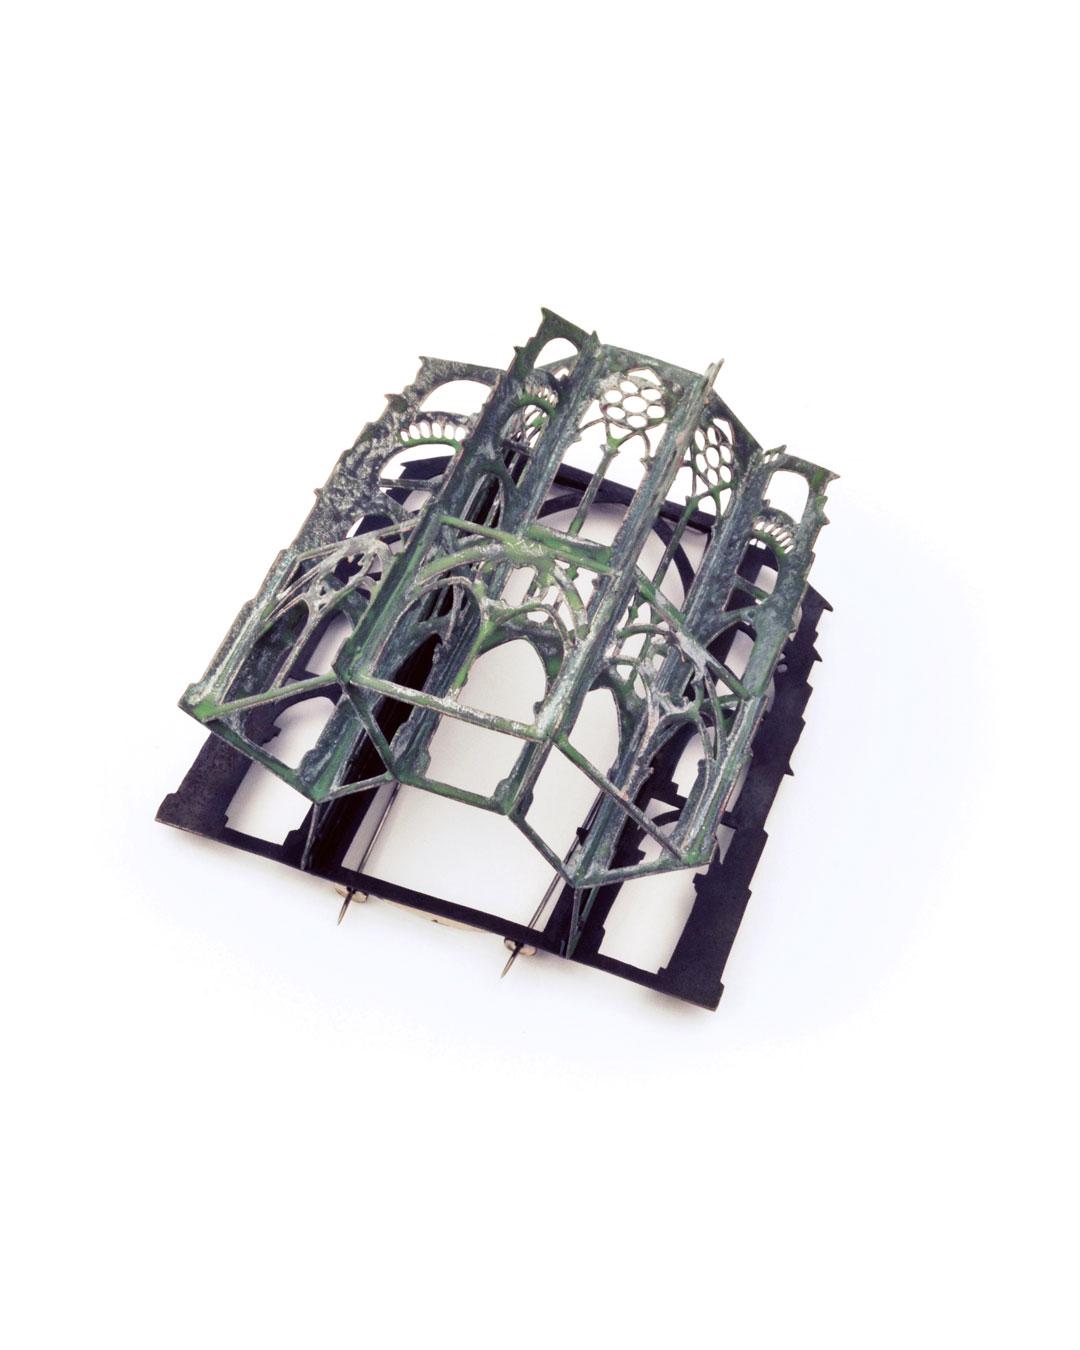 Vera Siemund, untitled, 2017, brooch; steel, enamelled copper, silver, 80 x 85 x 55 mm, €1575